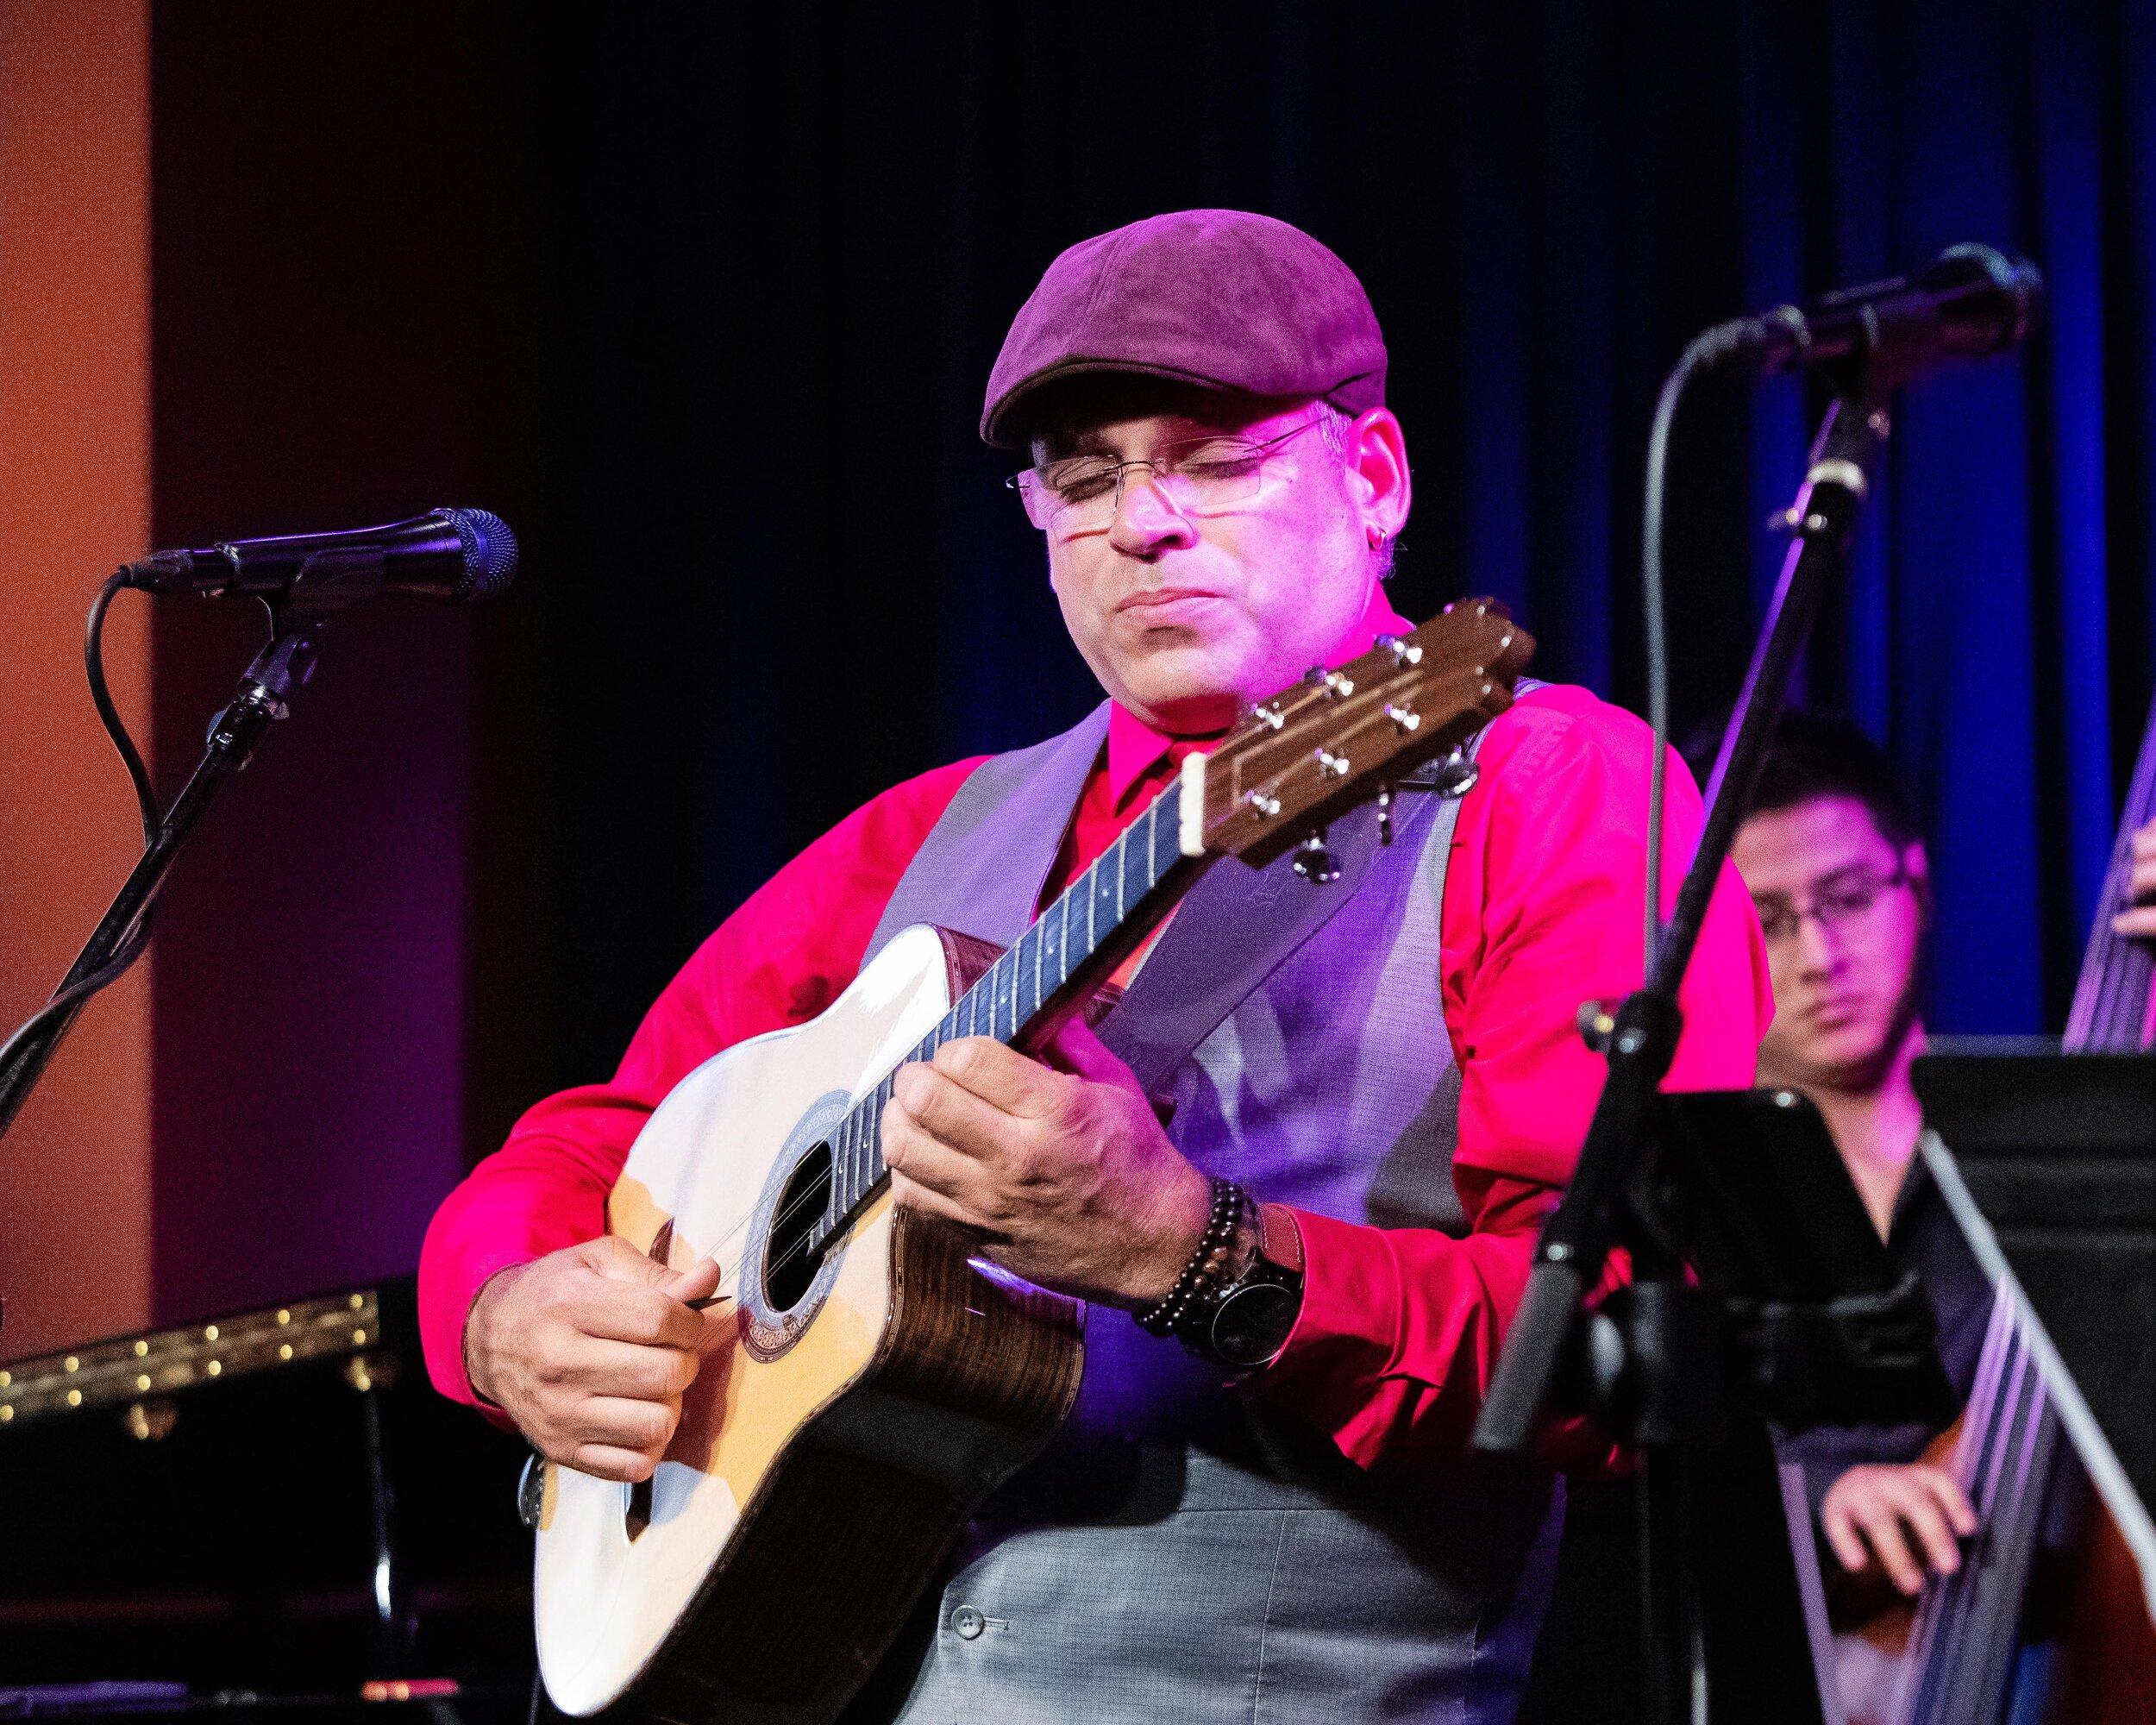 Ariel Cacheiro Lopez